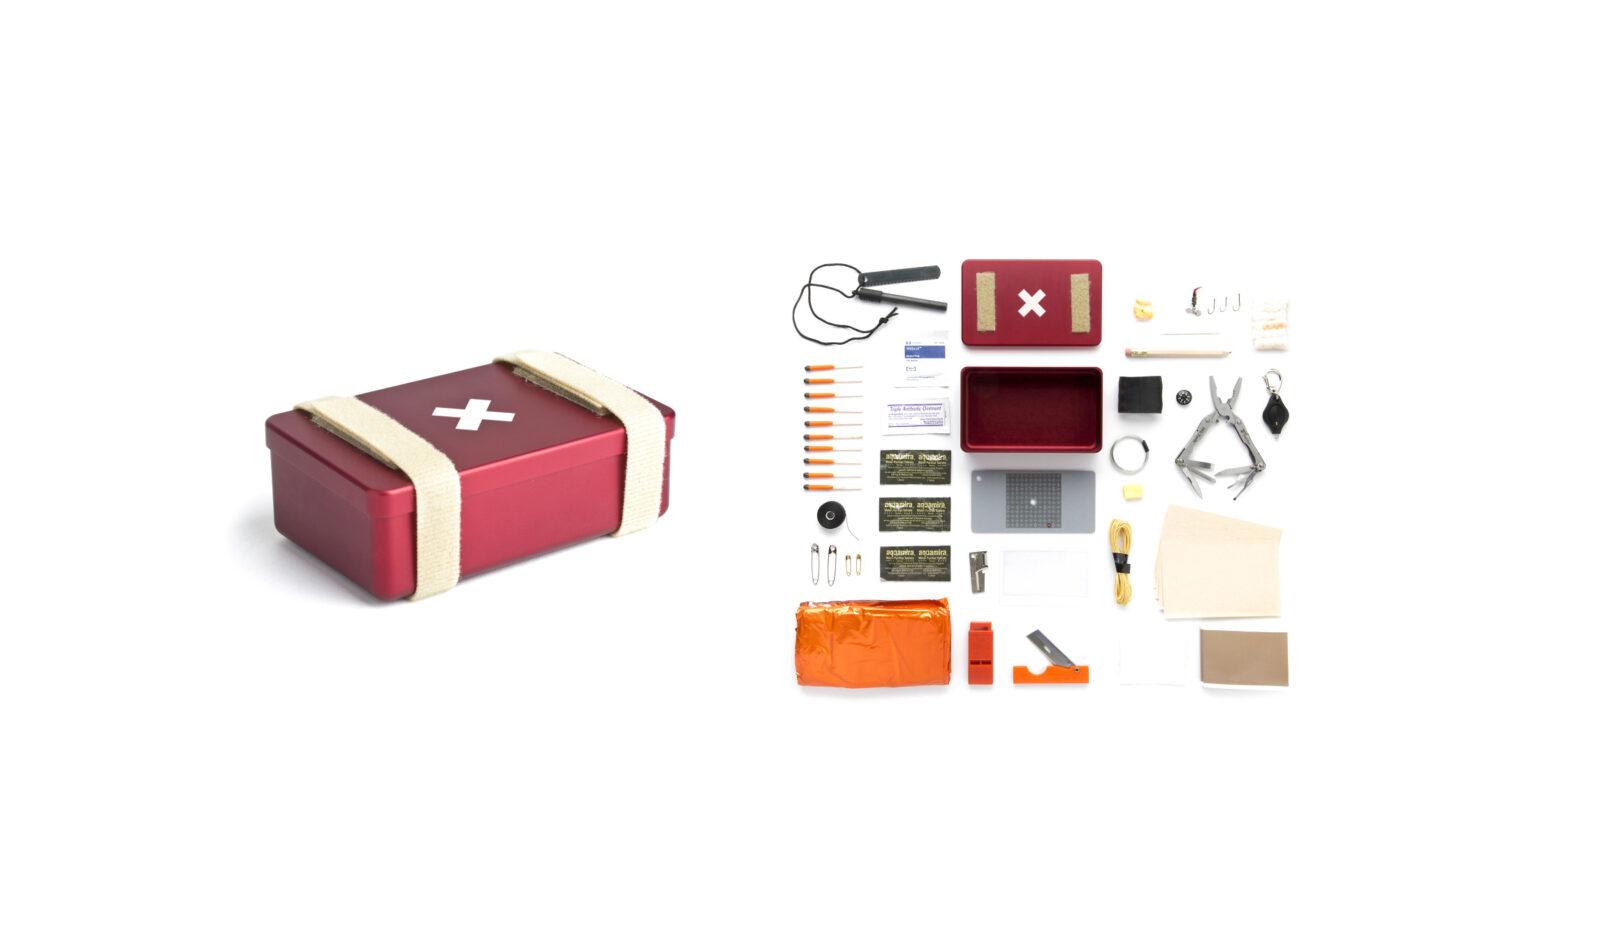 SOLKOA Survival Kit 1600x948 - SOLKOA Survival Kit